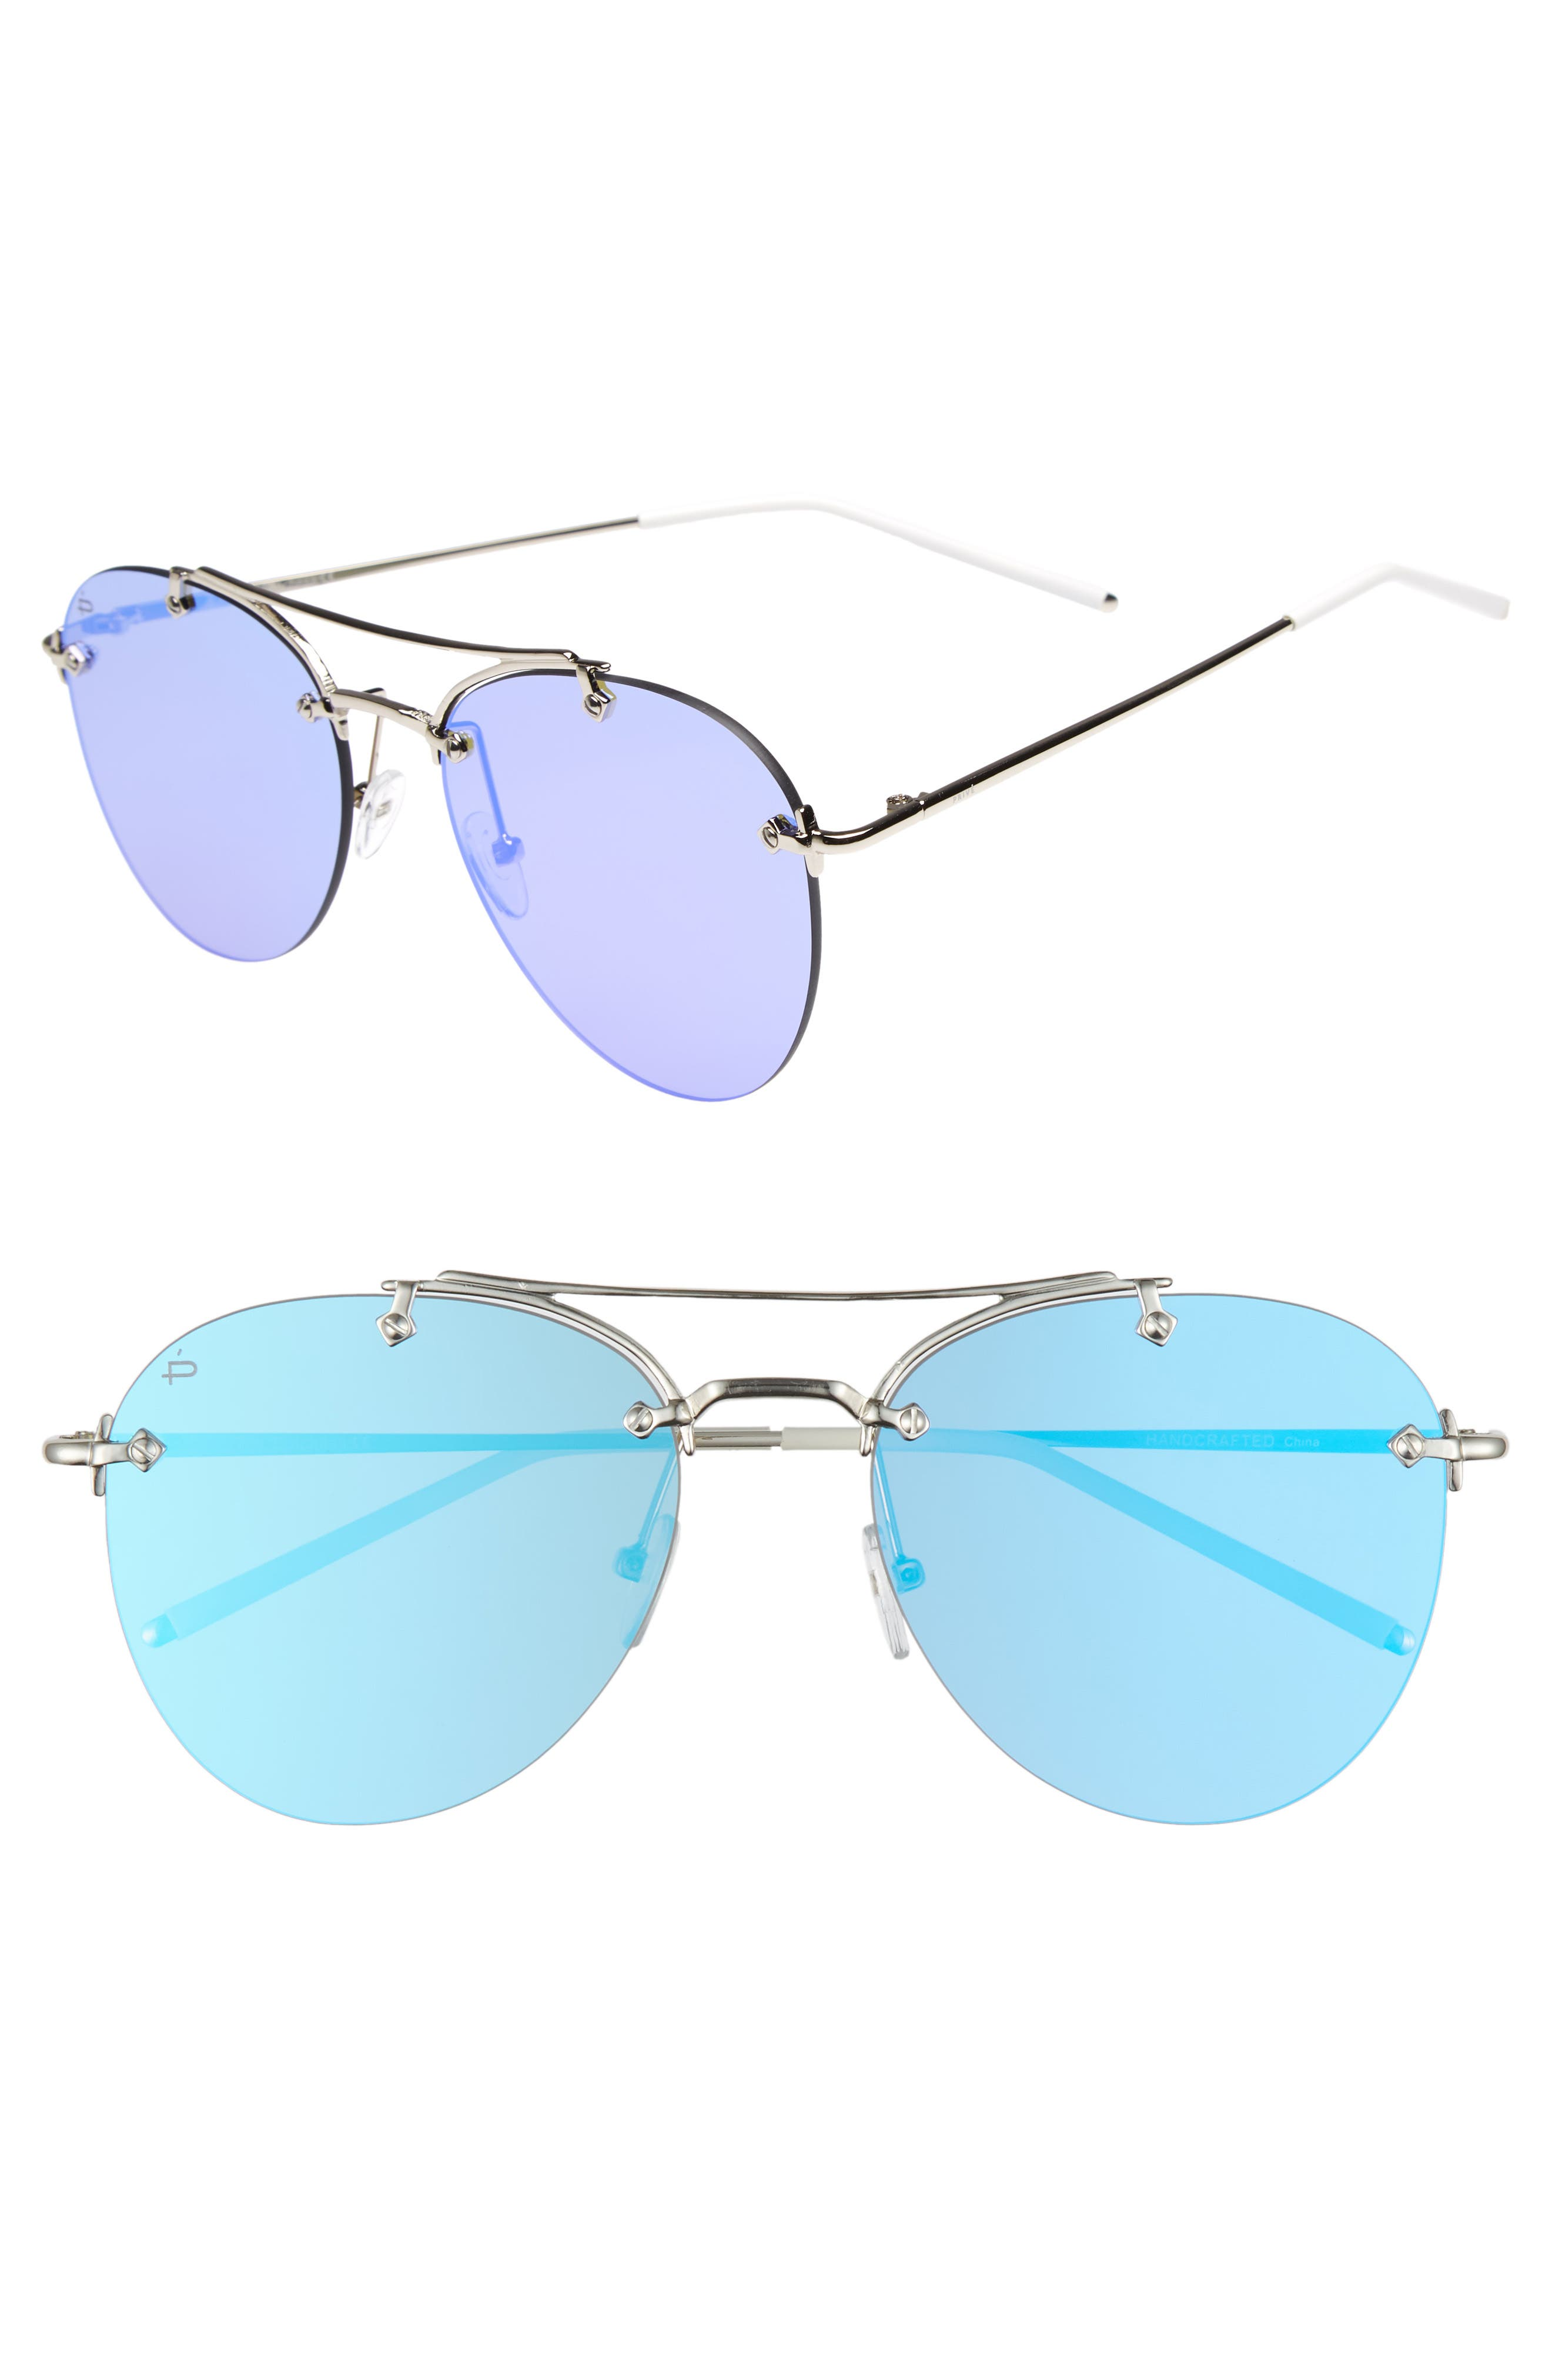 Privé Revaux The Dutchess 57mm Aviator Sunglasses,                             Main thumbnail 1, color,                             040